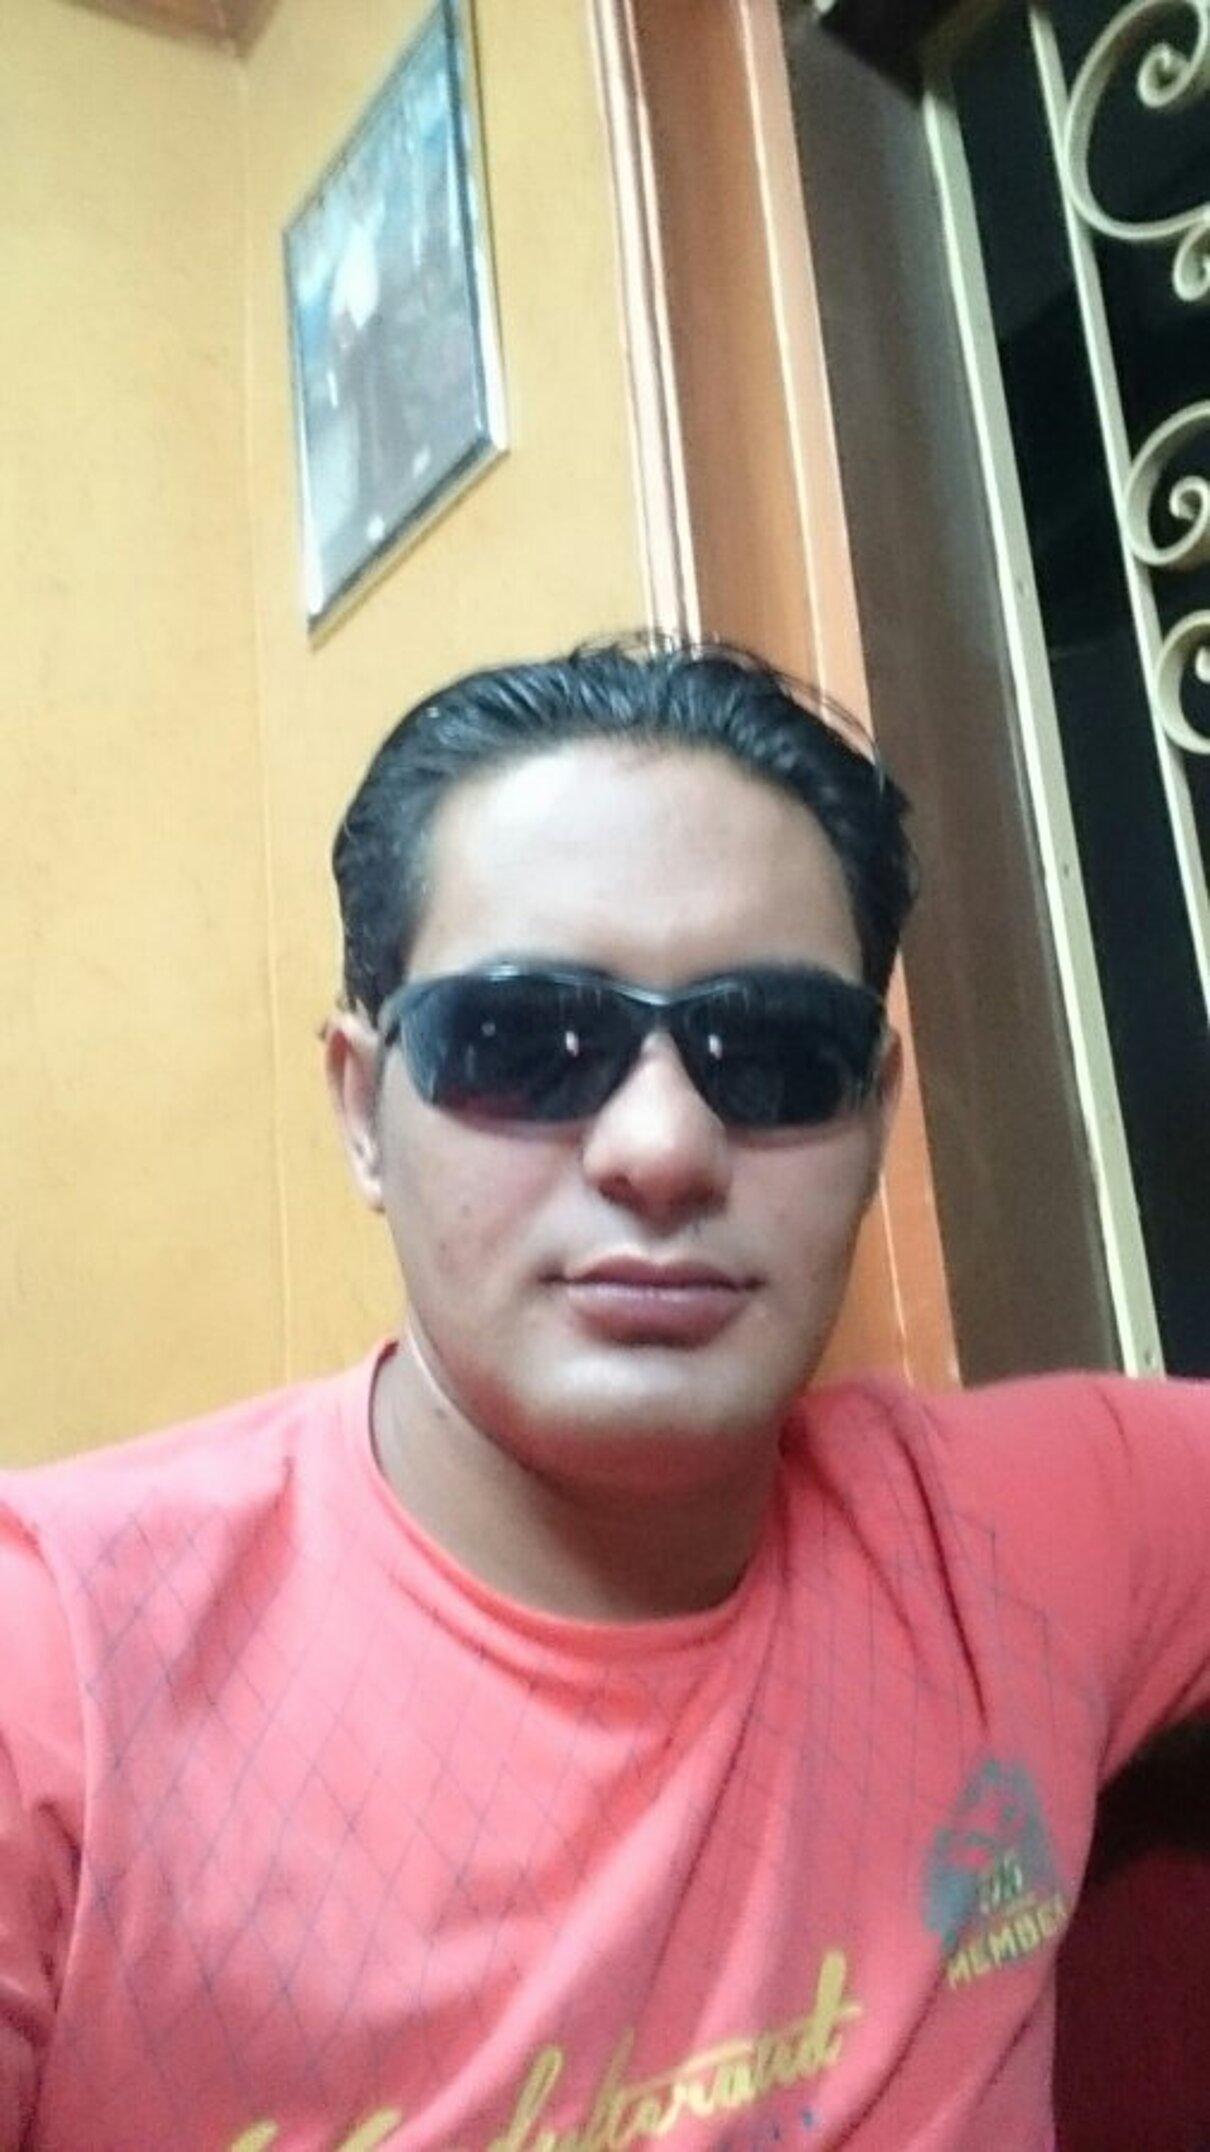 Жалоба-отзыв: Hamada Wageh Abdelhamed Aly Deyab - Аферист.  Фото №2